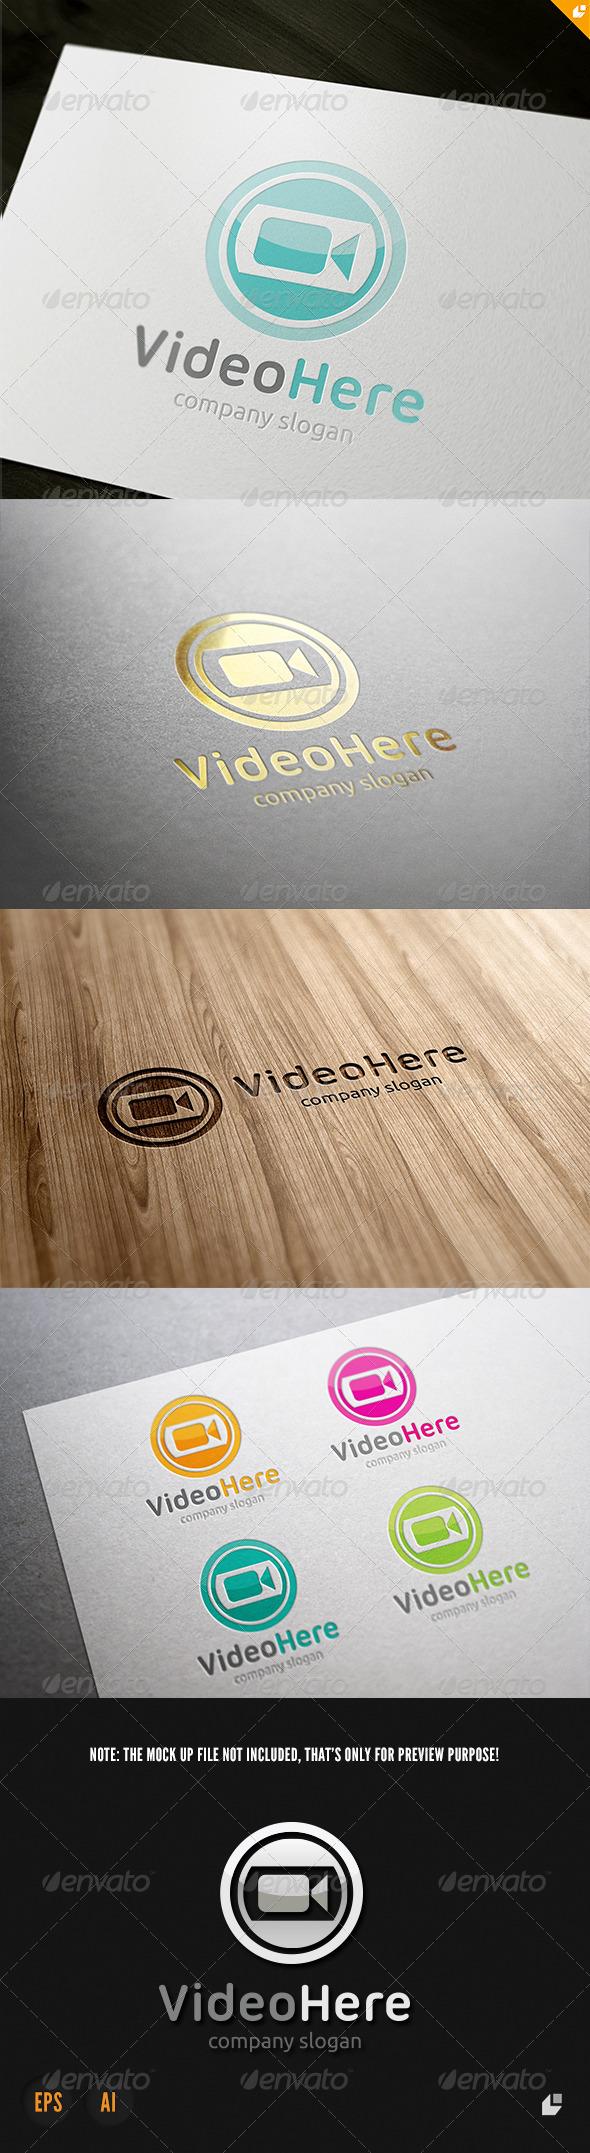 GraphicRiver Video Here Logo 3791432